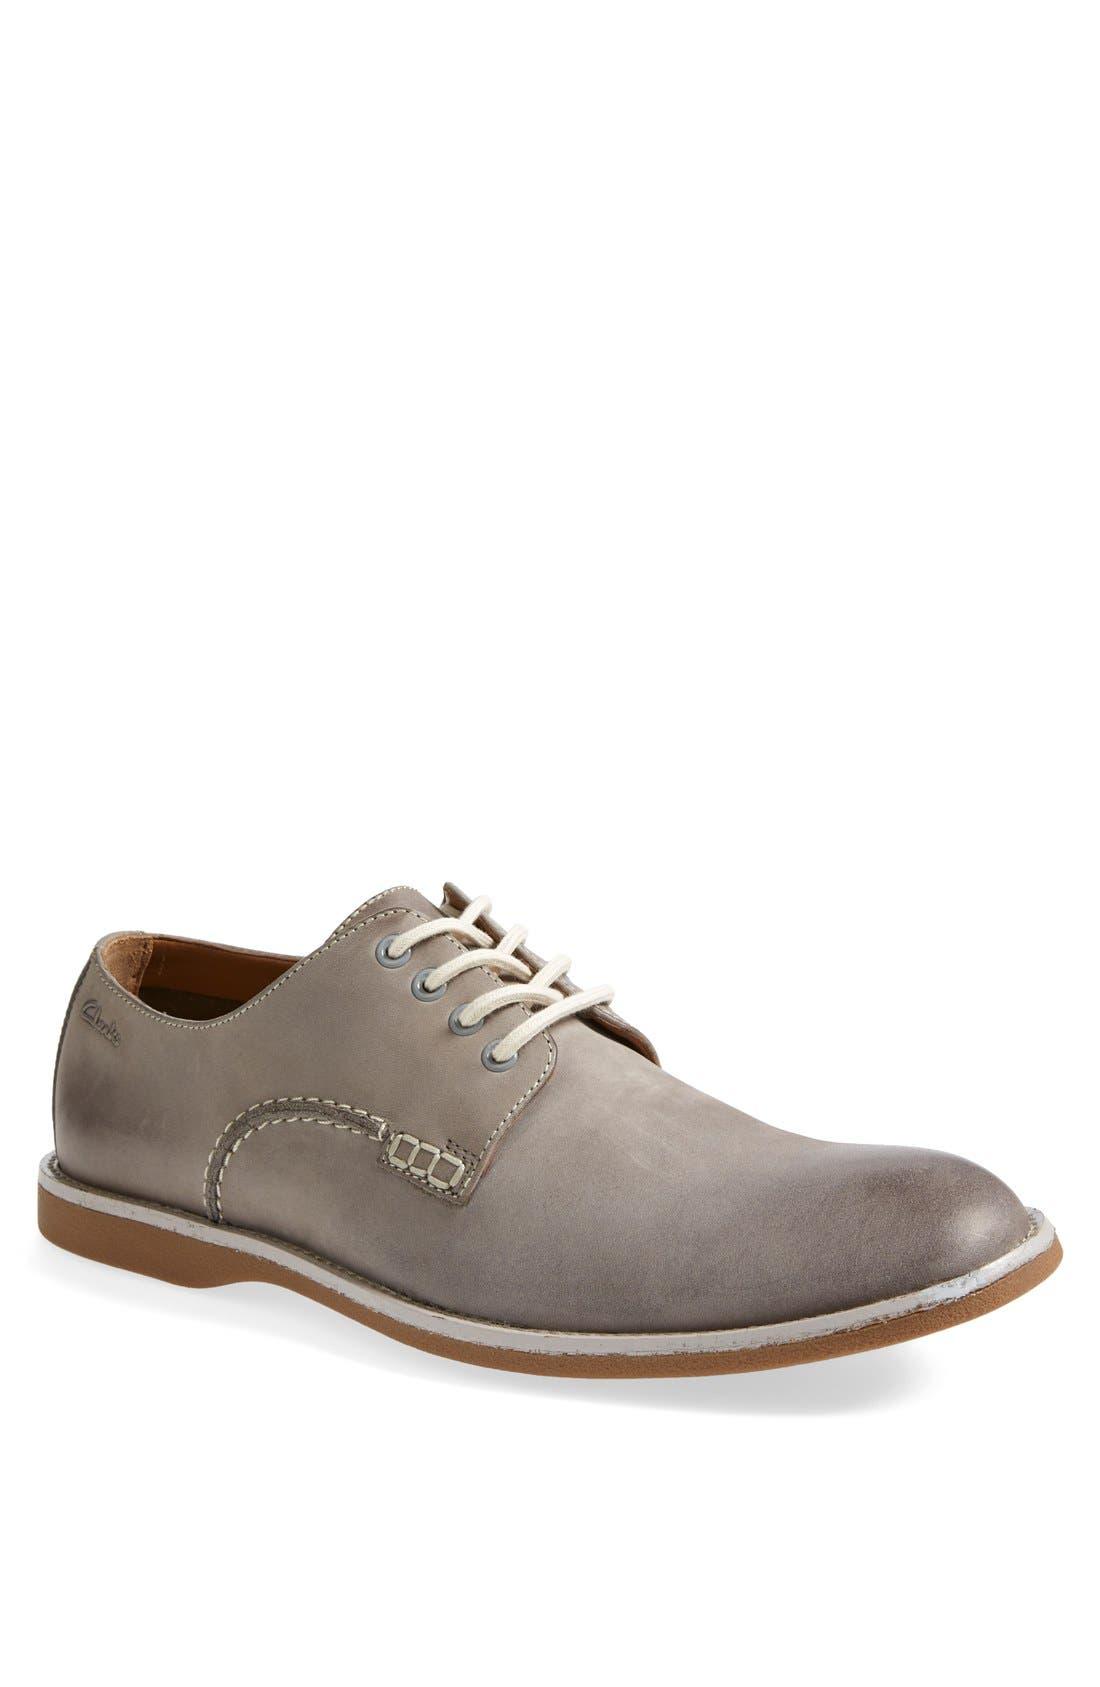 Alternate Image 1 Selected - Clarks® 'Farli Walk' Plain Toe Derby   (Men)